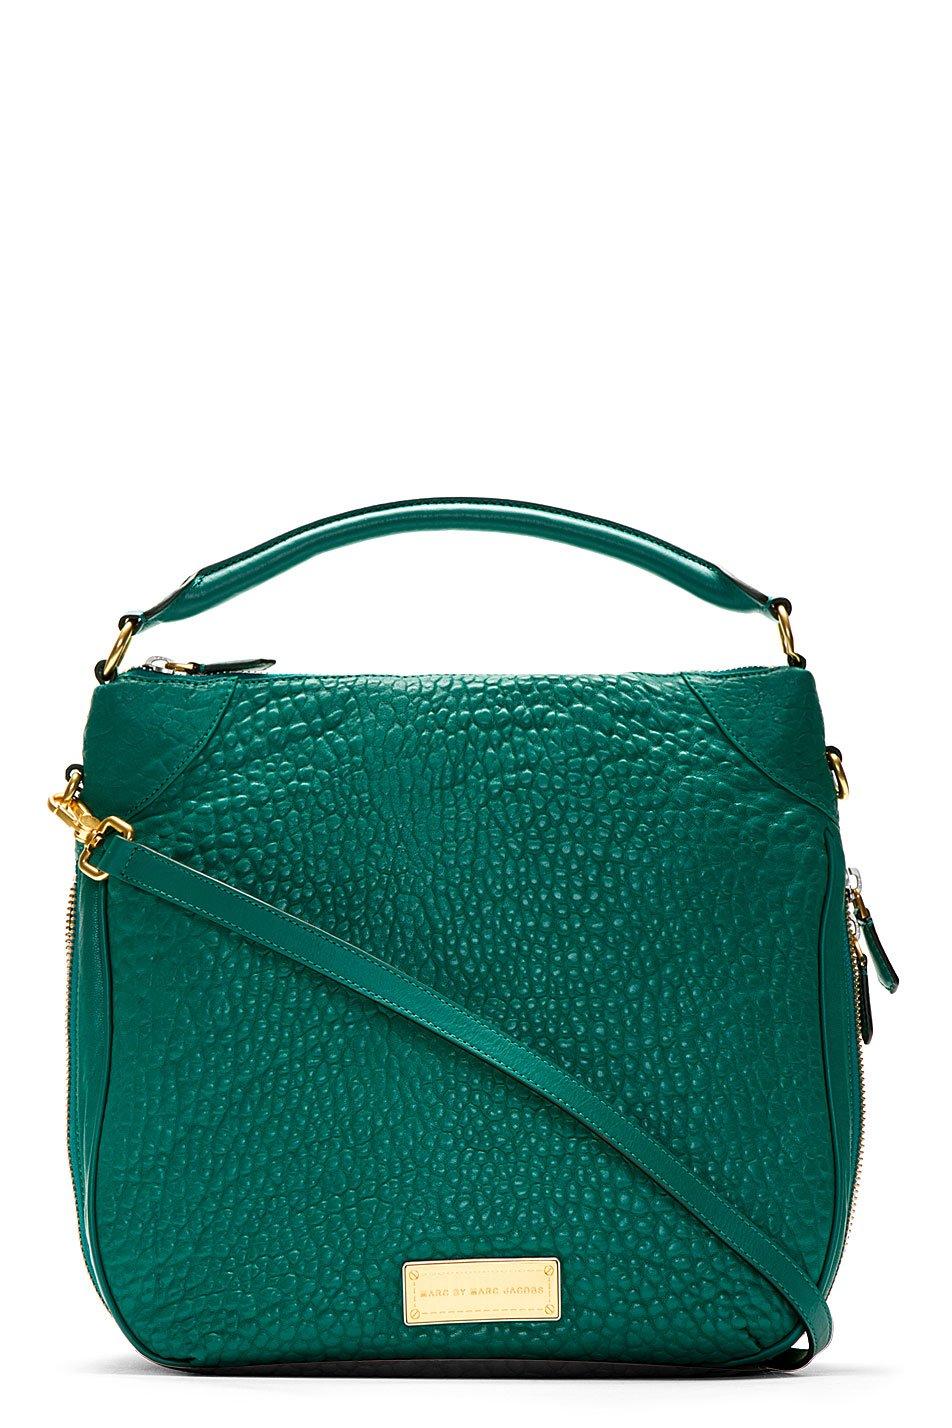 marc by marc jacobs green pebbled leather shoulder bag